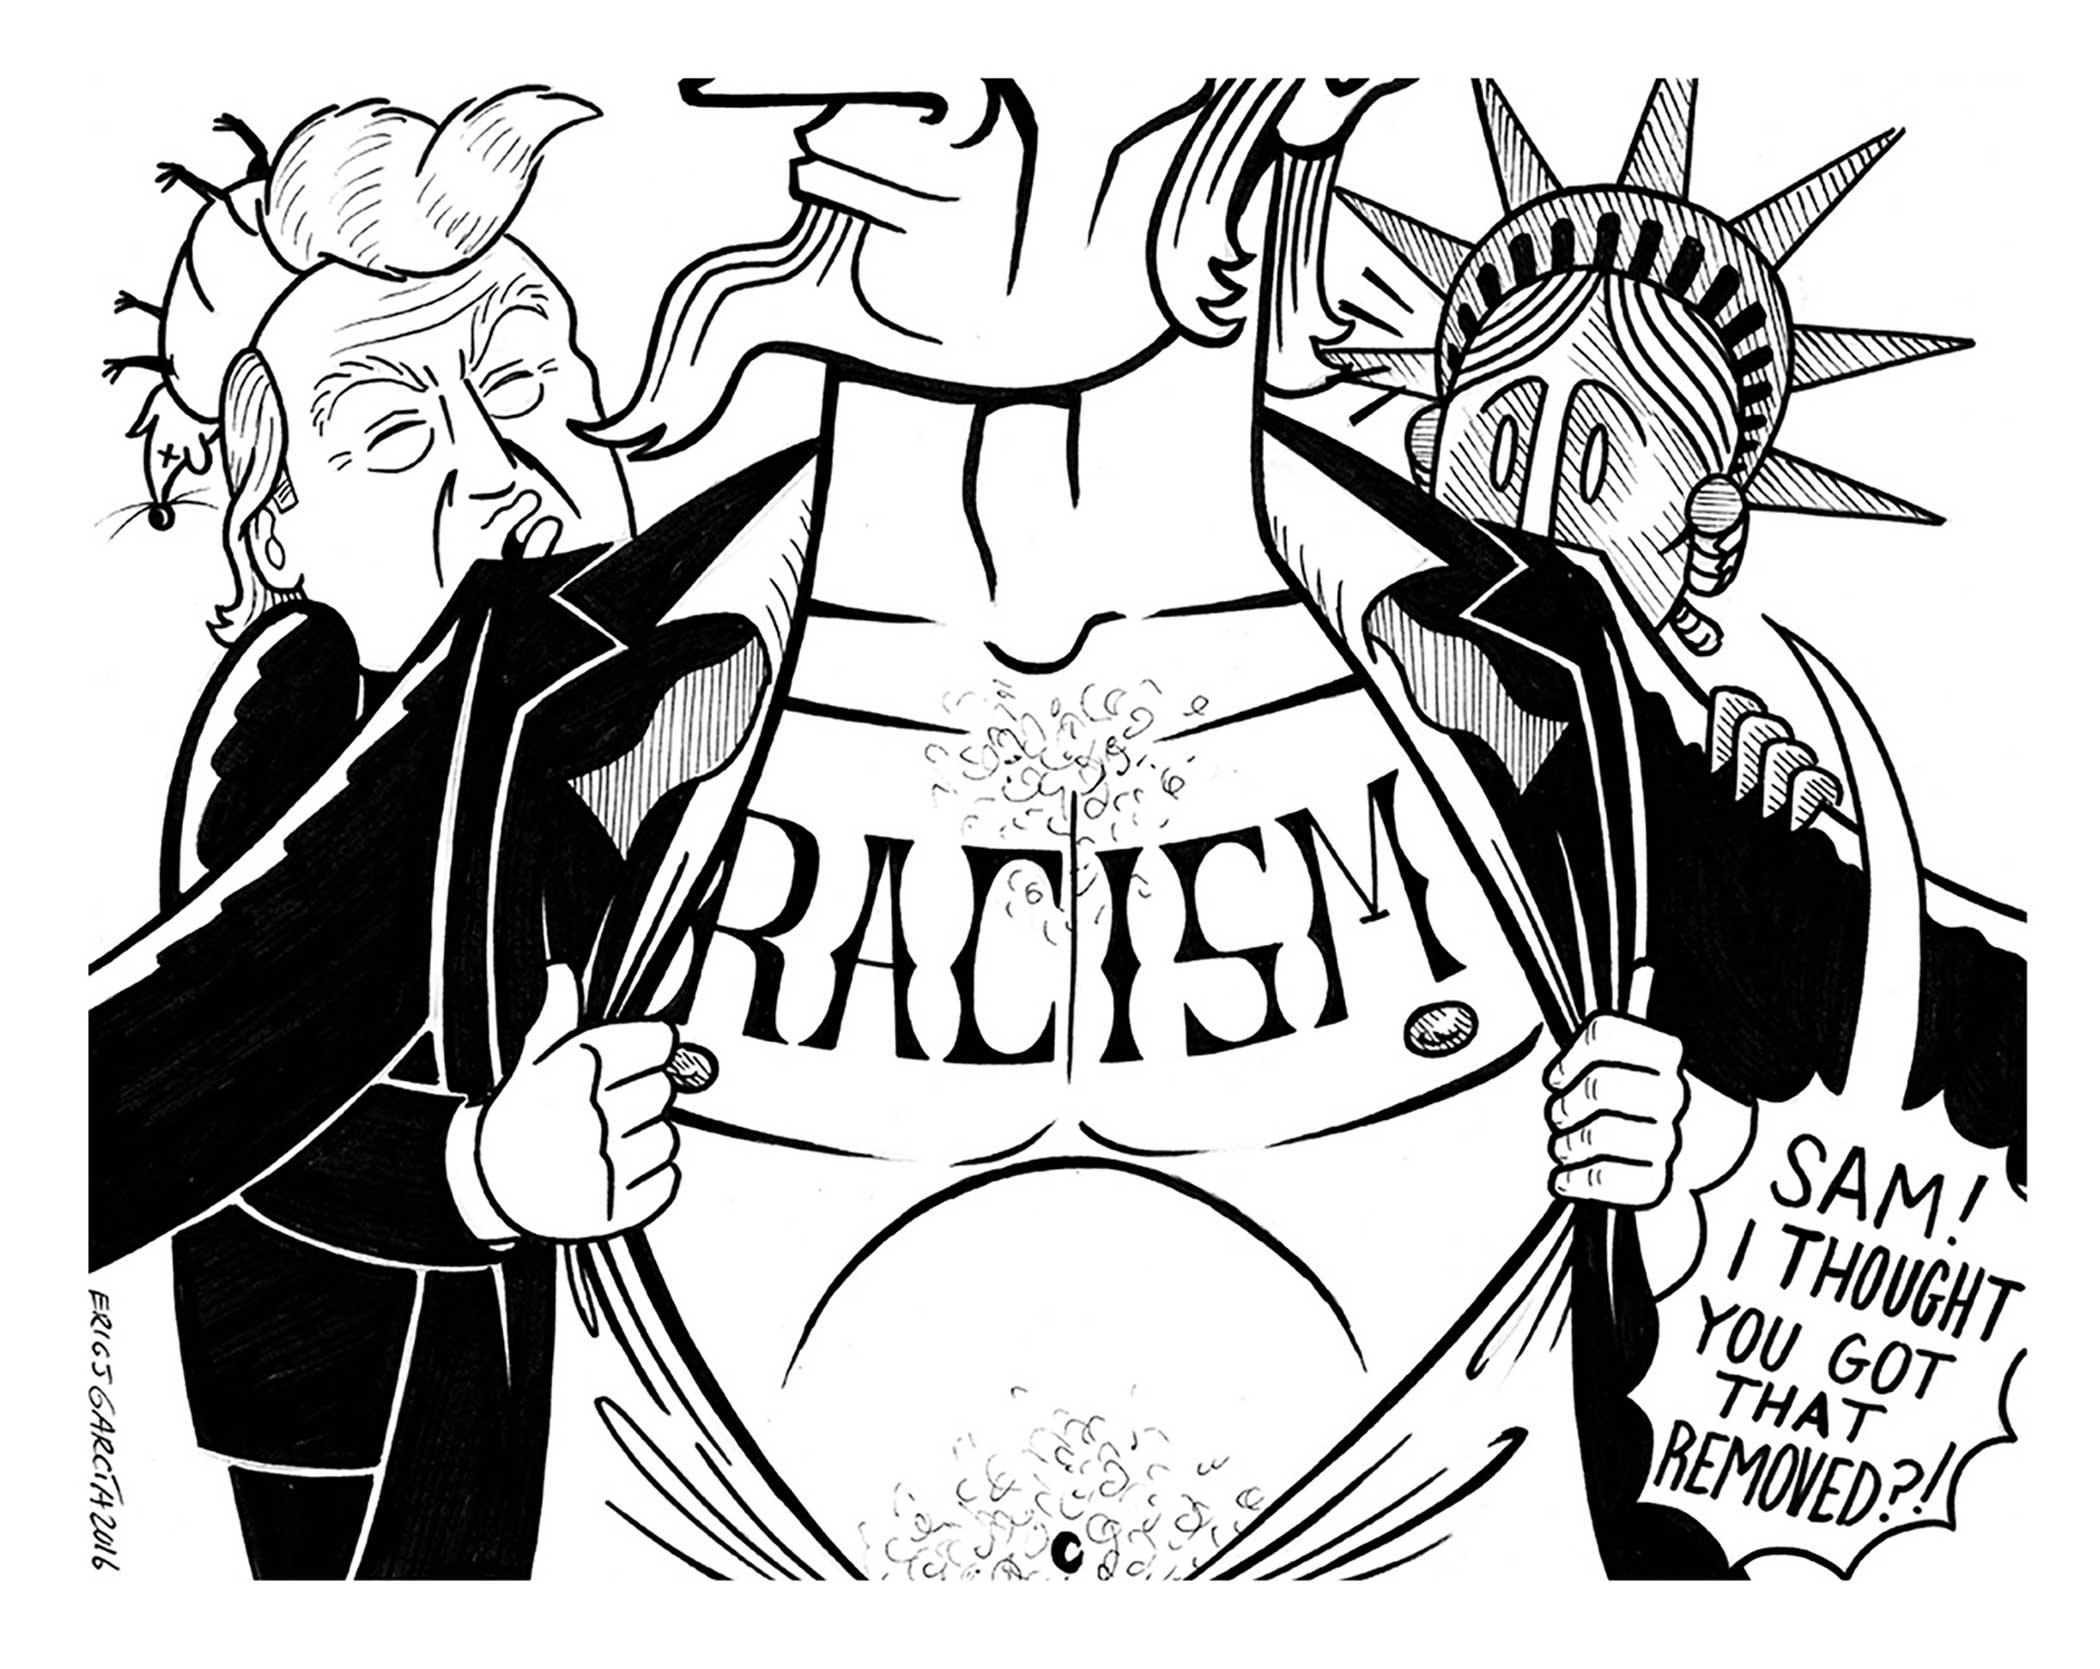 Eric J. Garcia , Drawing on Anger , pg. 169.